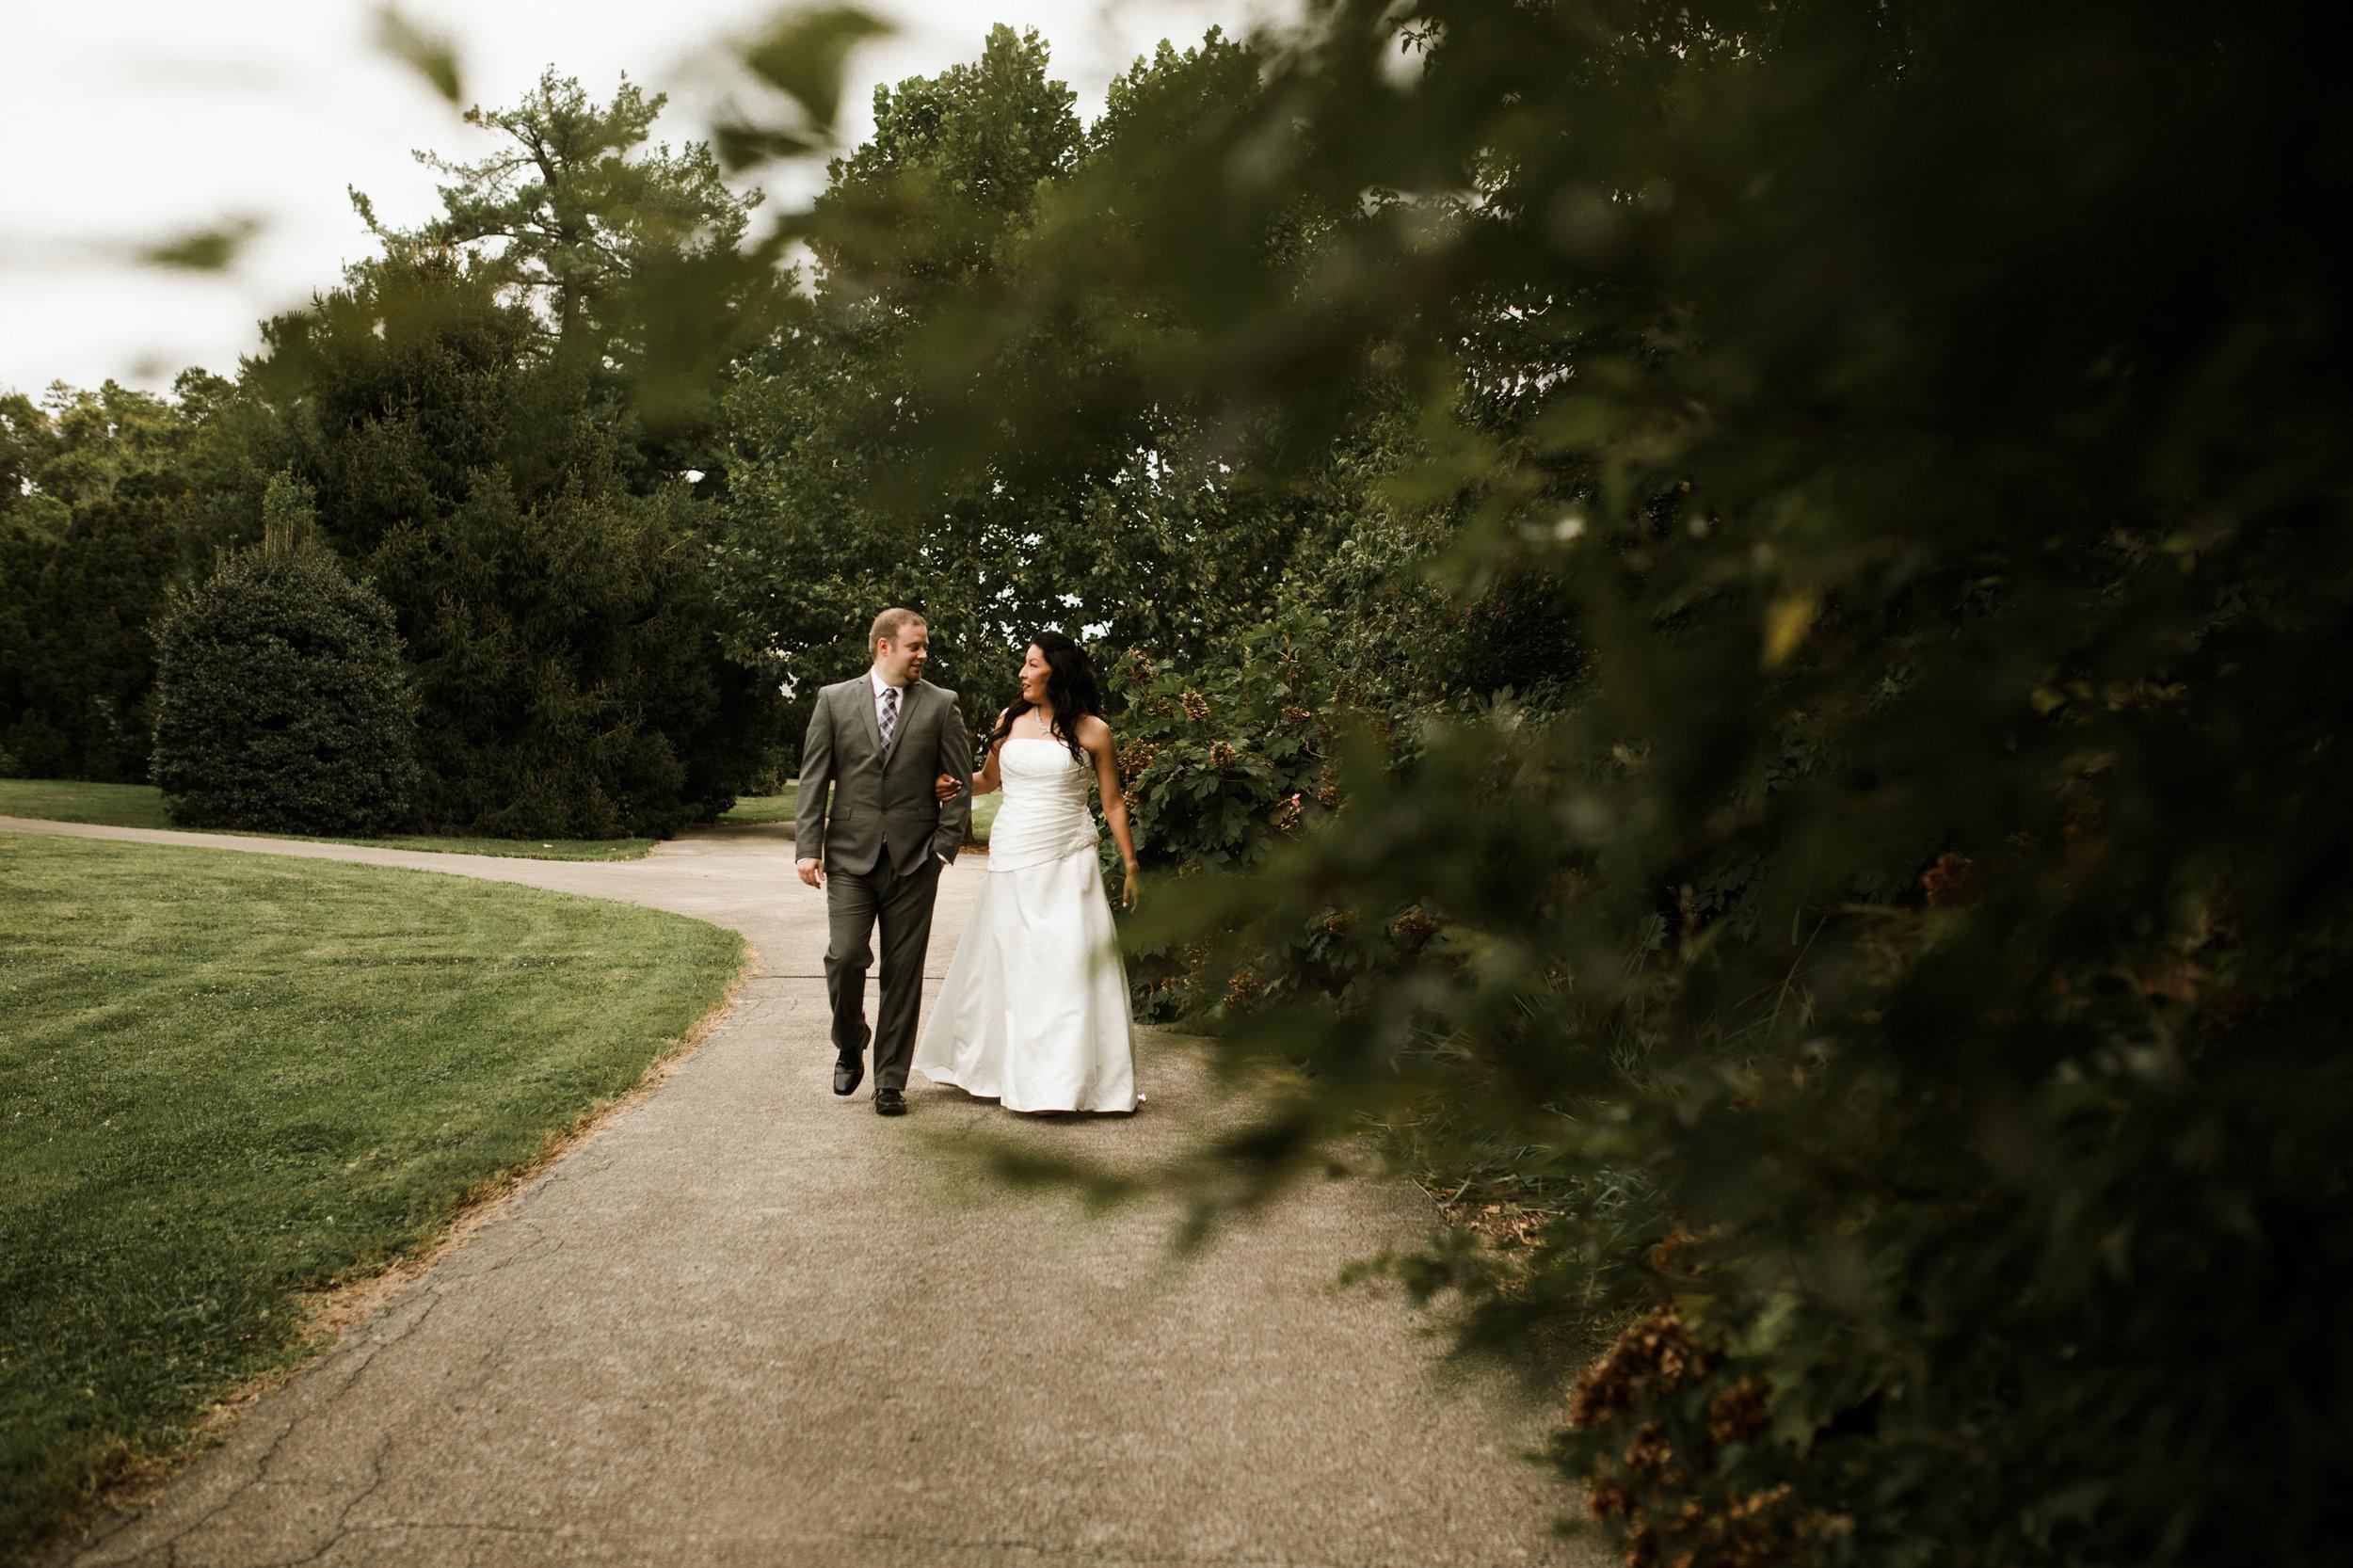 Kentucky Wedding Louisville Wedding Photographer 2018 Crystal Ludwick Photo Louisville Wedding Photographer Kentucky Wedding Photographer (20 of 76).jpg